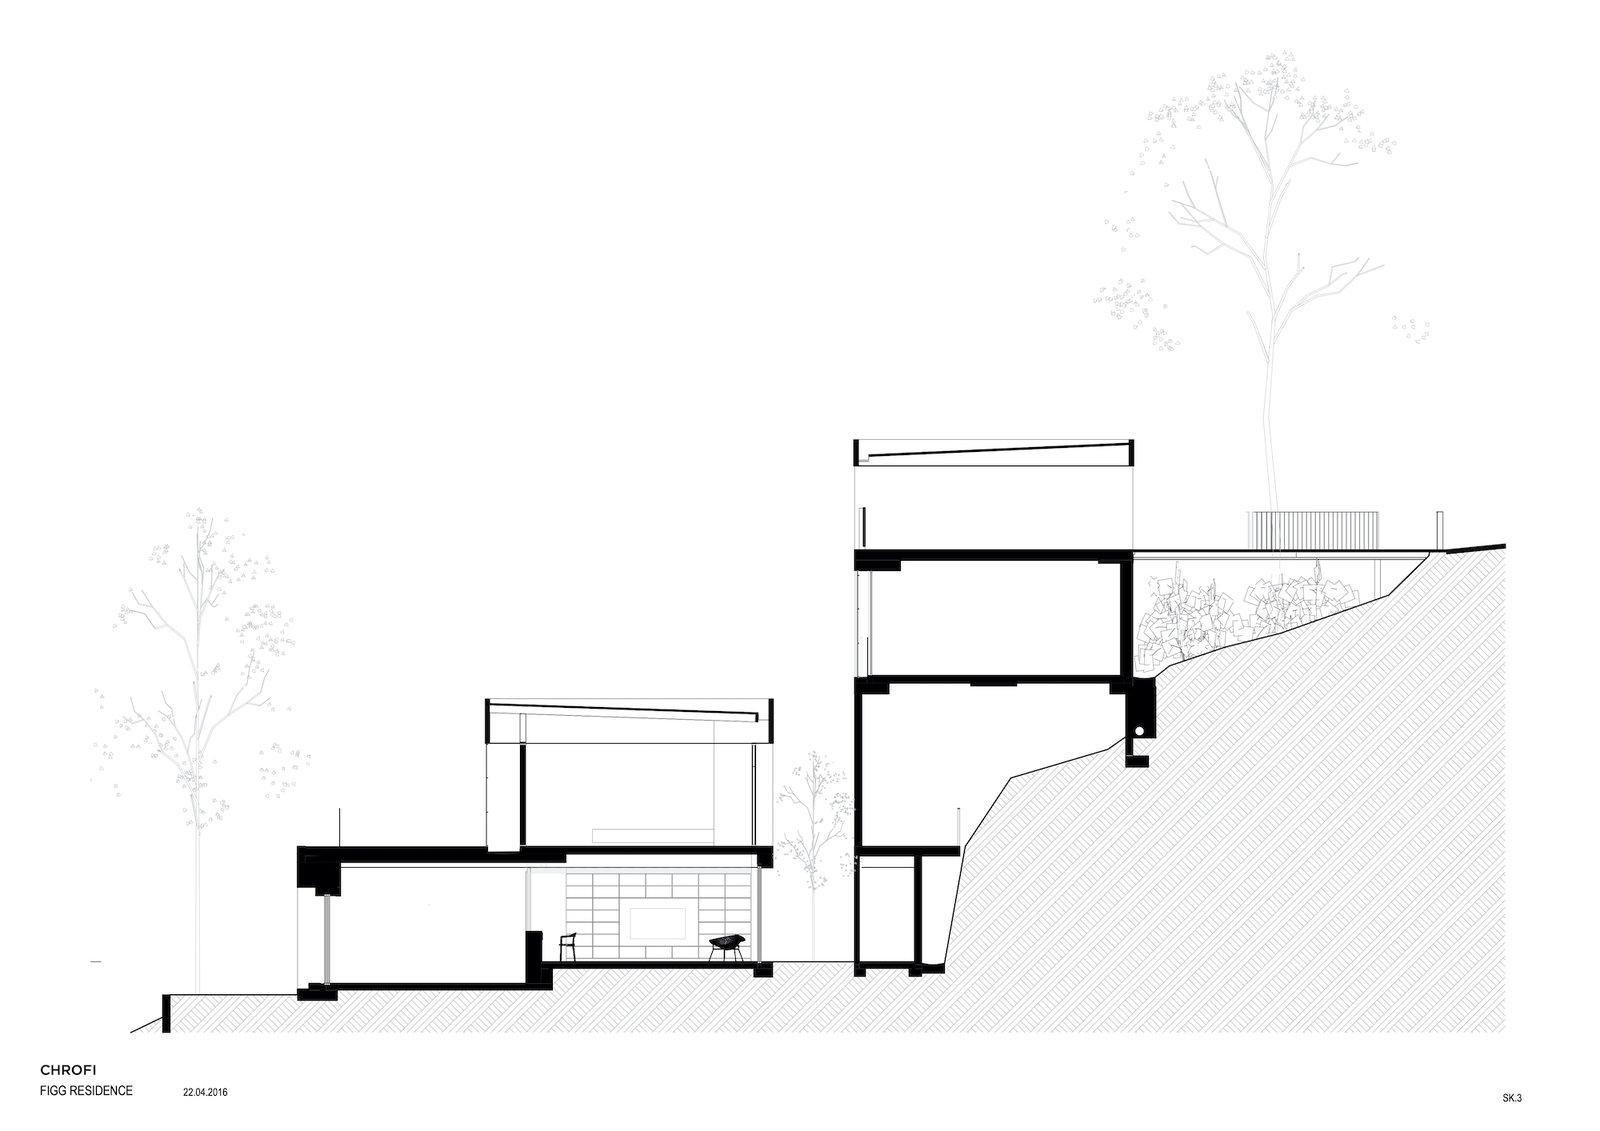 Section of Church Point House by CHROFI